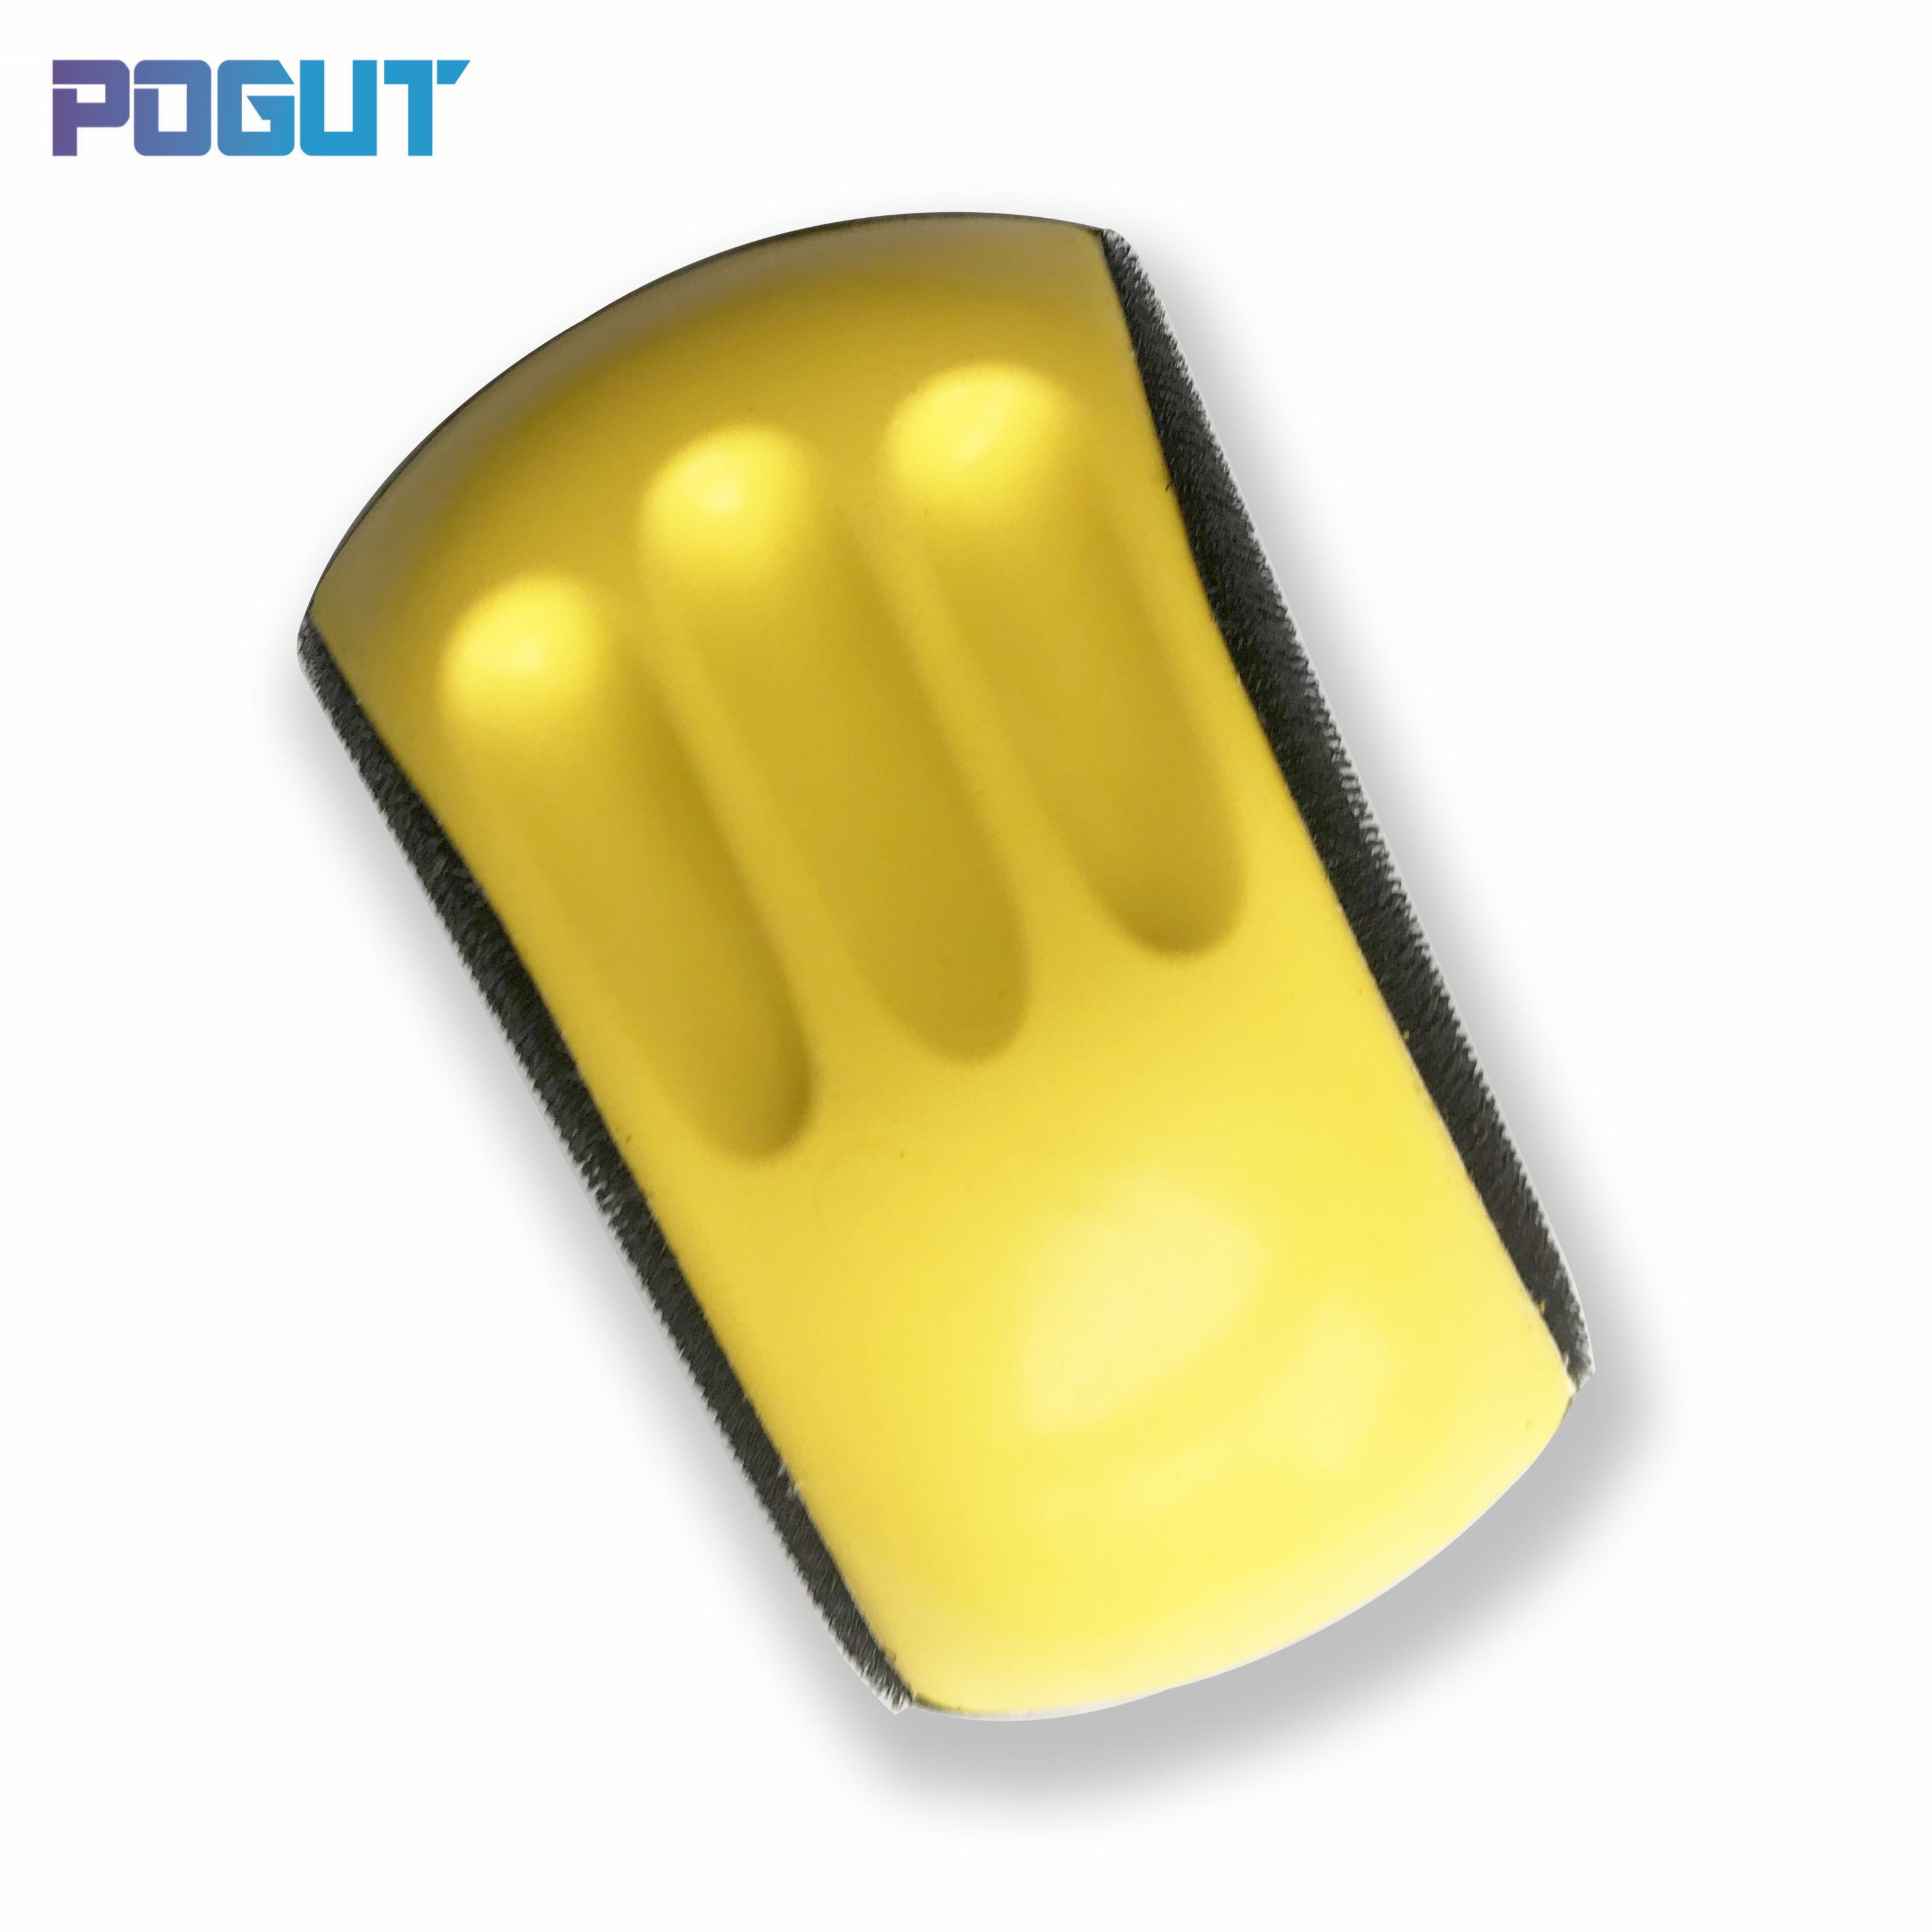 "6"" Mouse Shaped Backing Base Pad Hand Grinding Block for Hook & Loop Sanding Disc Sandpaper"